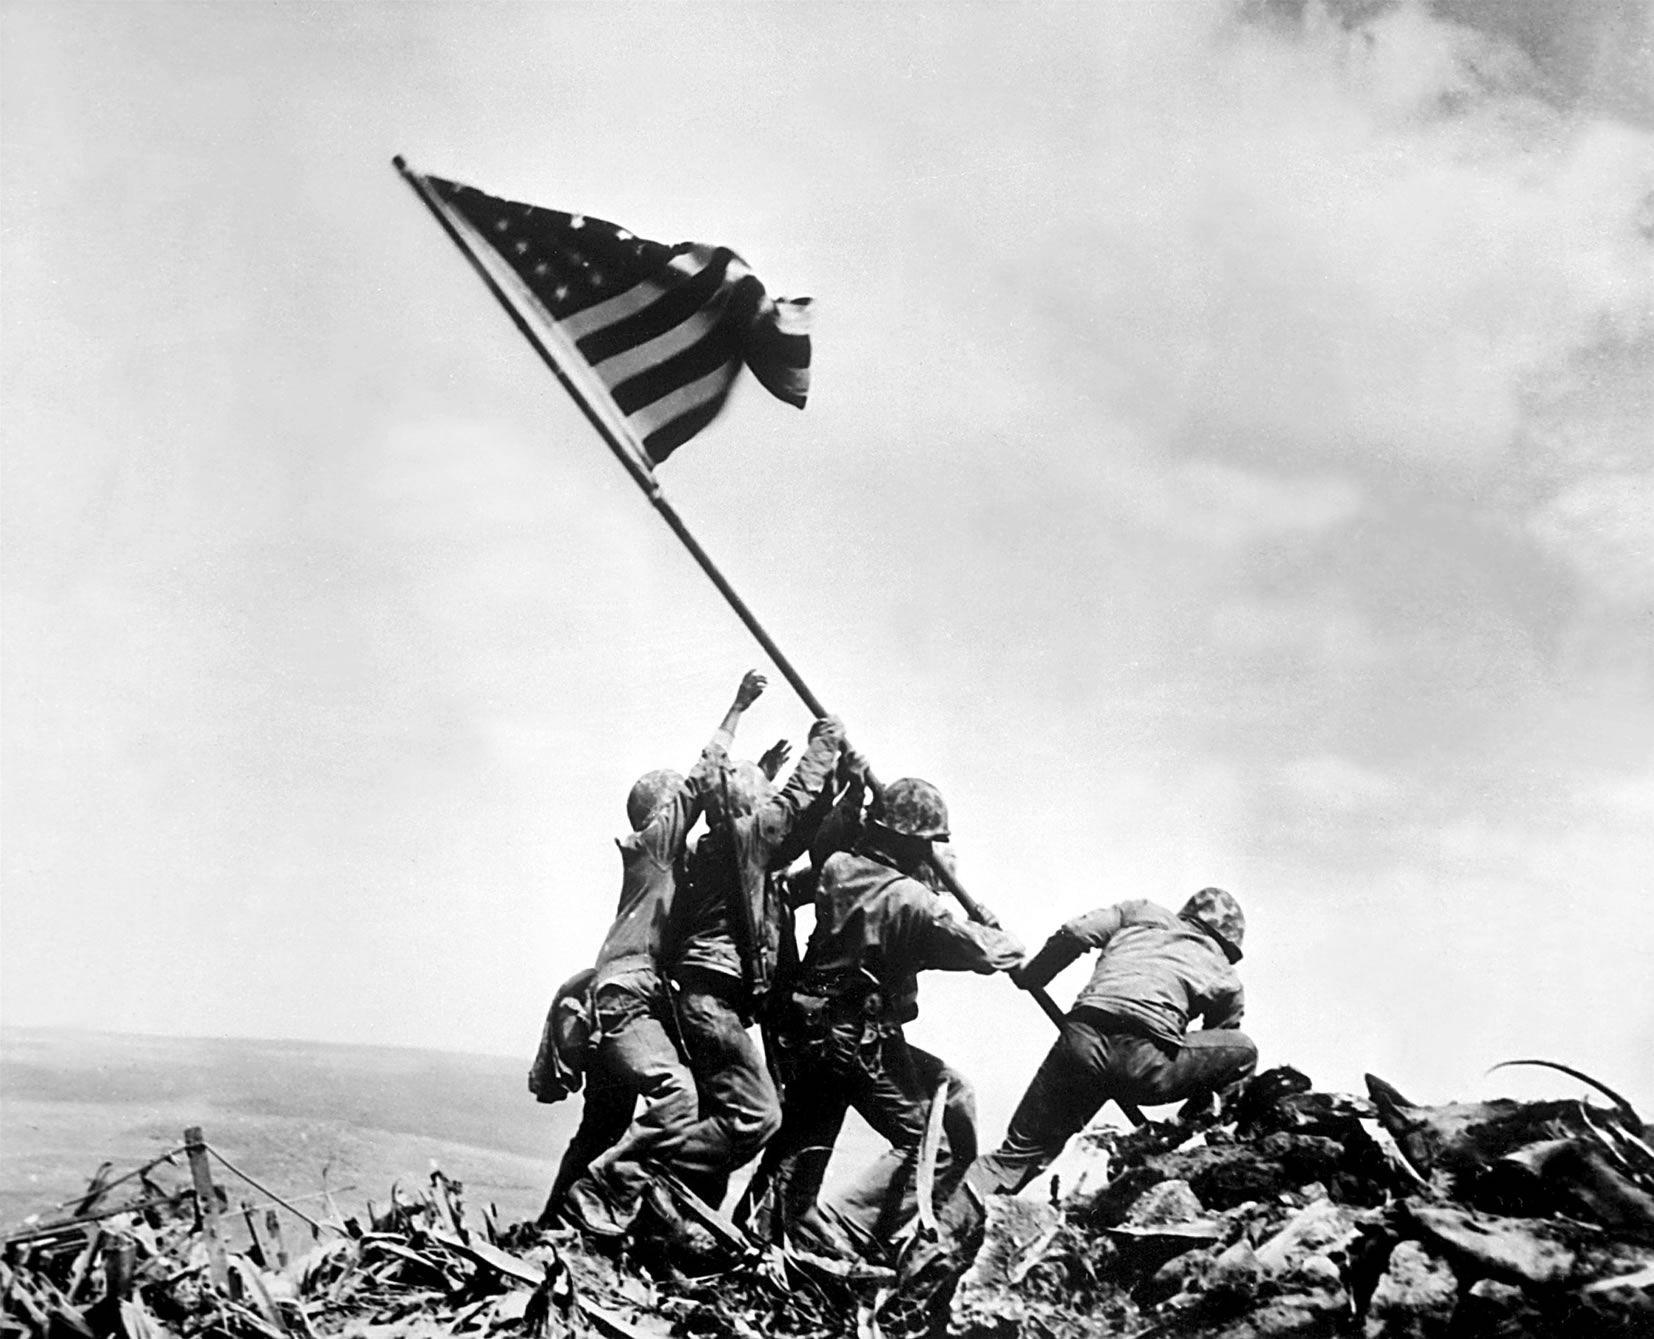 Flag Raising On Iwo Jima February 23 1945 Joe Rosenthal Associated Press Navy From The Crest Of Mount Suribachi The Sta Battle Of Iwo Jima Iwo Jima Iwo